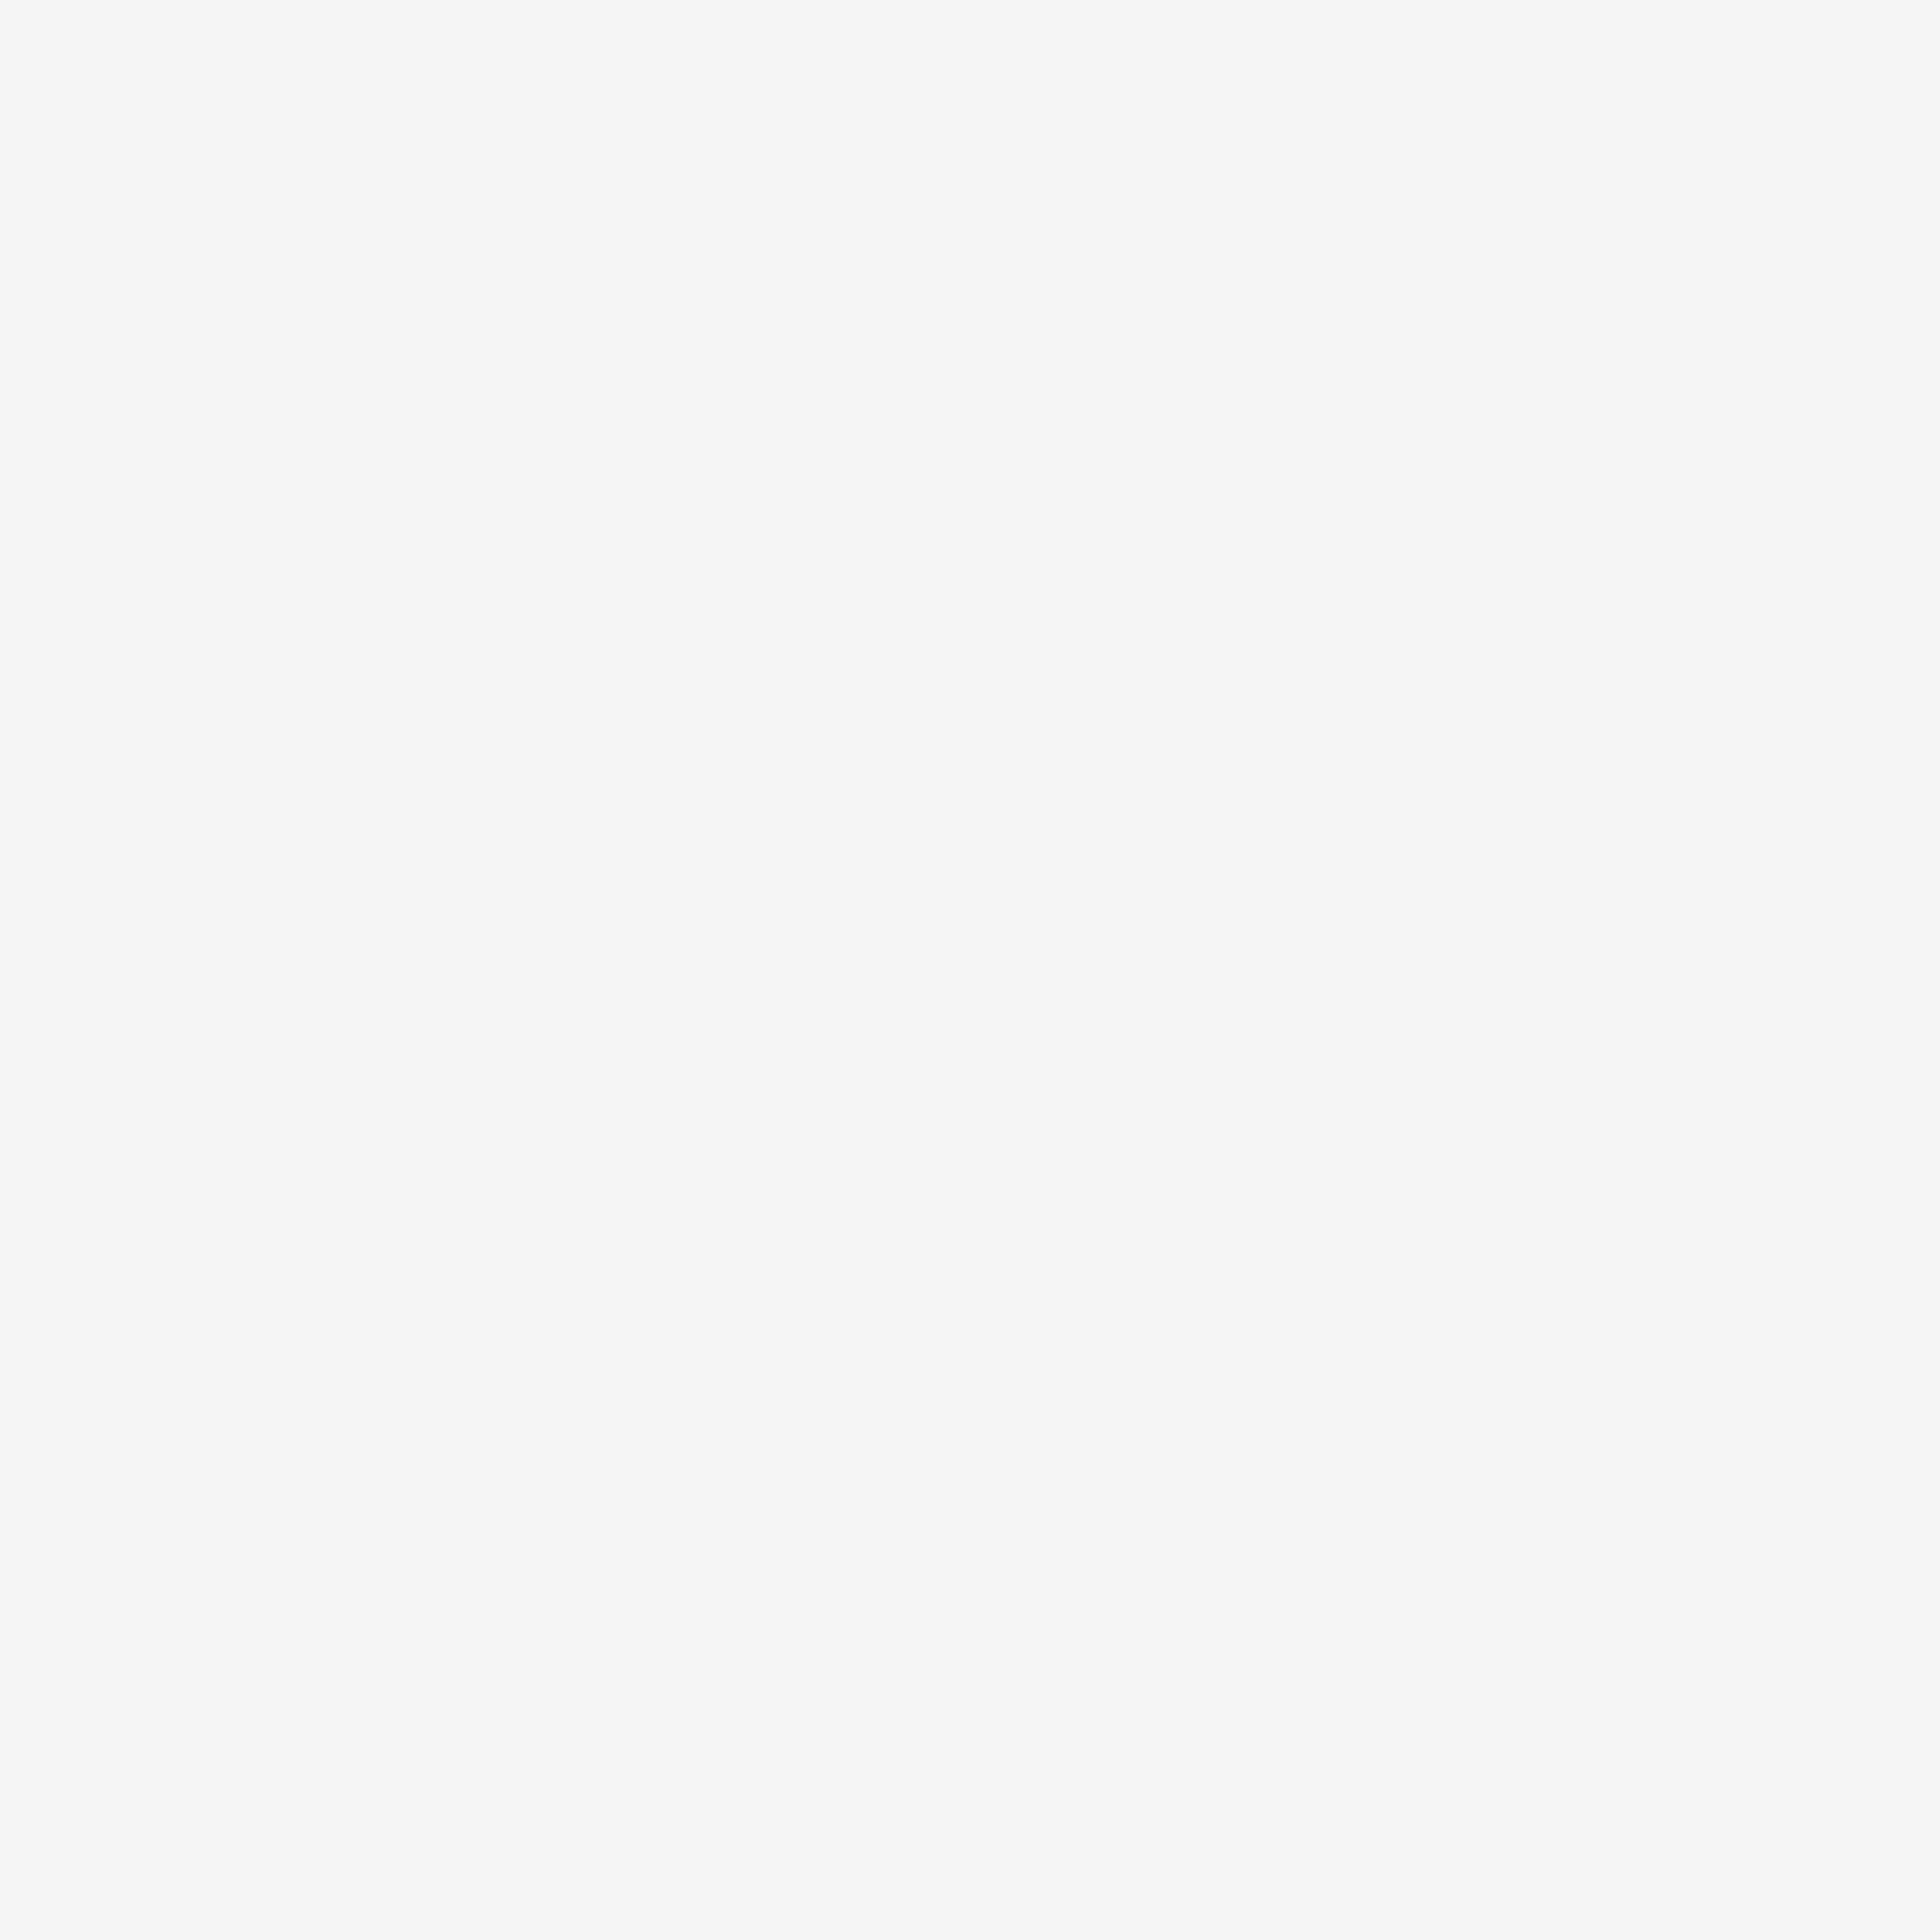 f2e04eea6f7 Hugo Boss 50408040 order online   Oxener Shoes